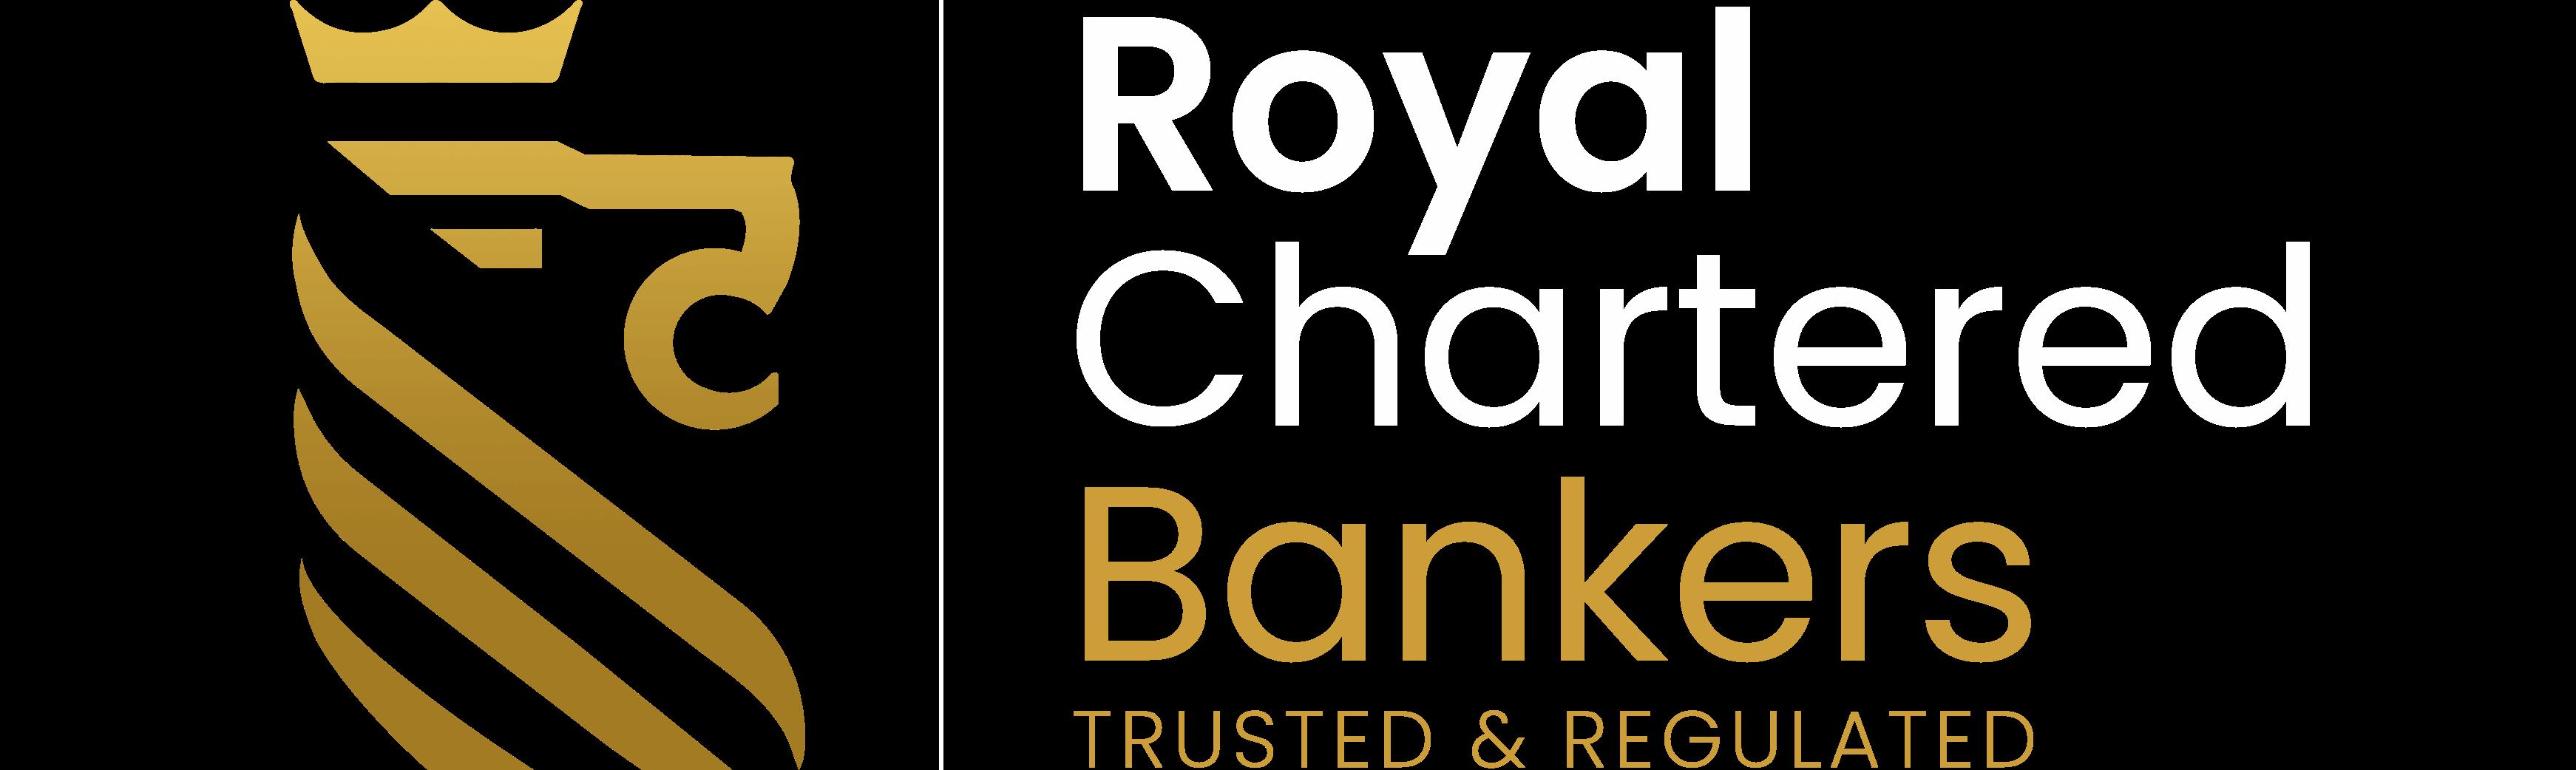 Royal Chartered Bankers